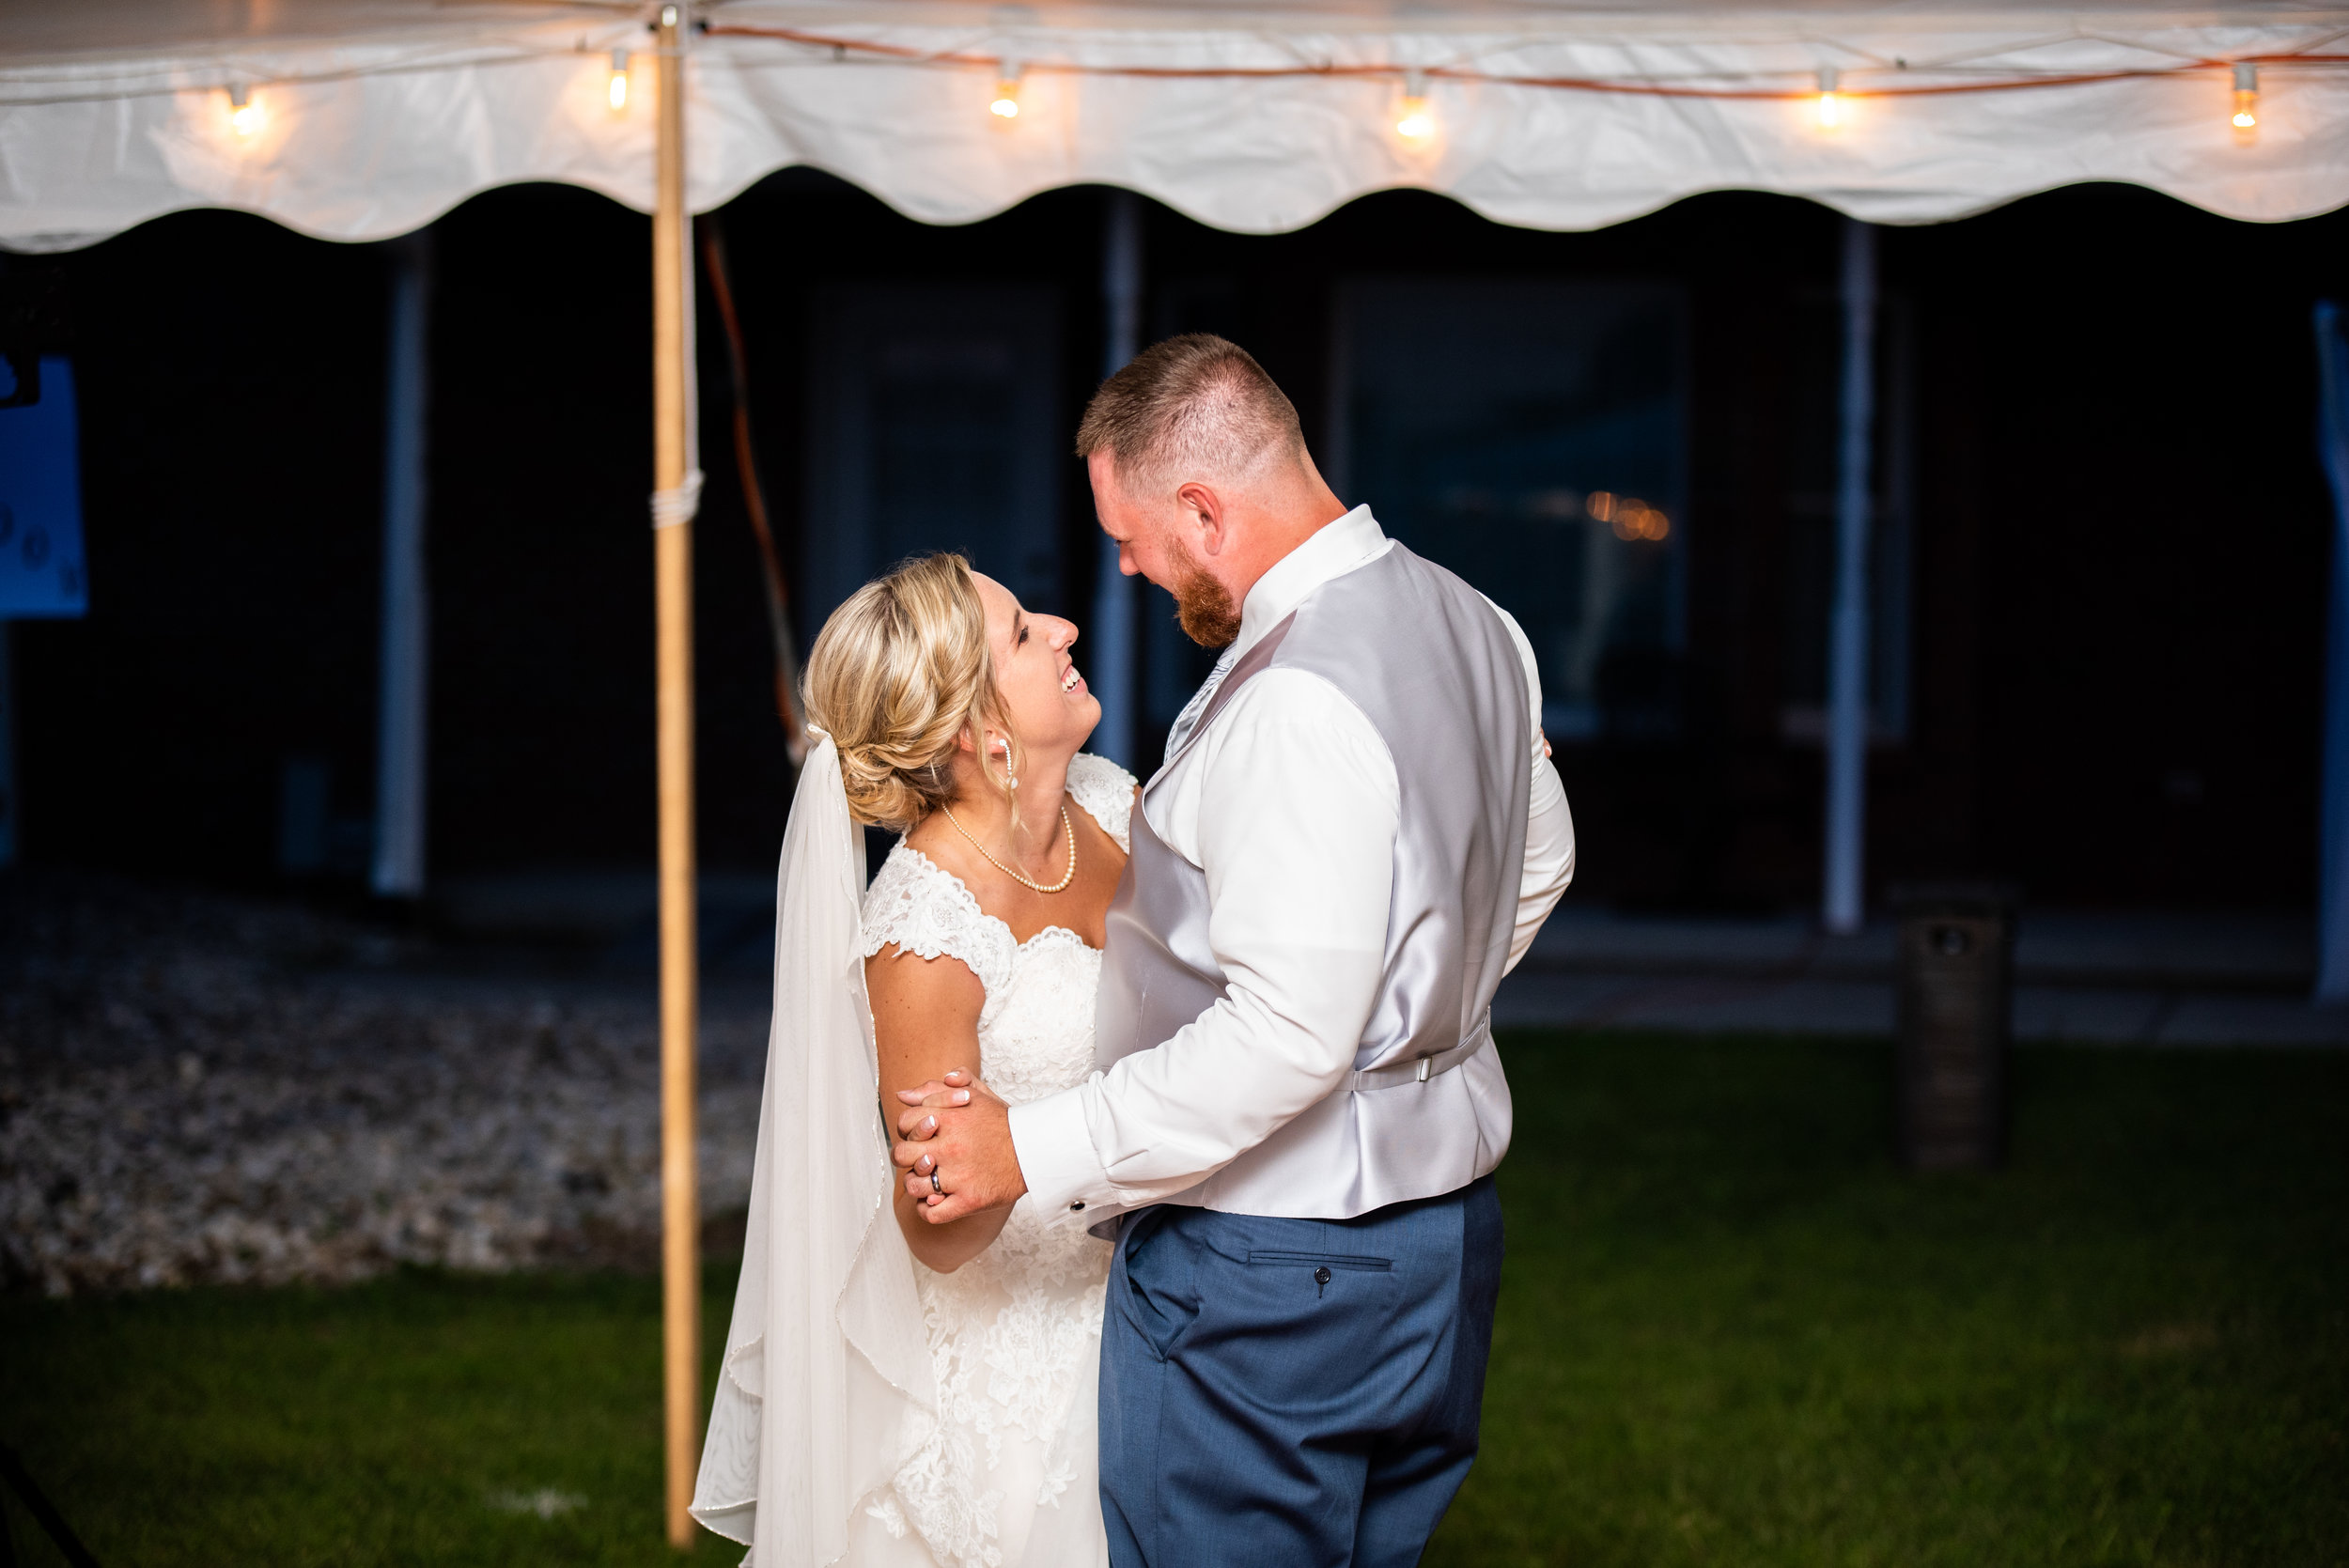 wedding (1 of 1)-220.jpg